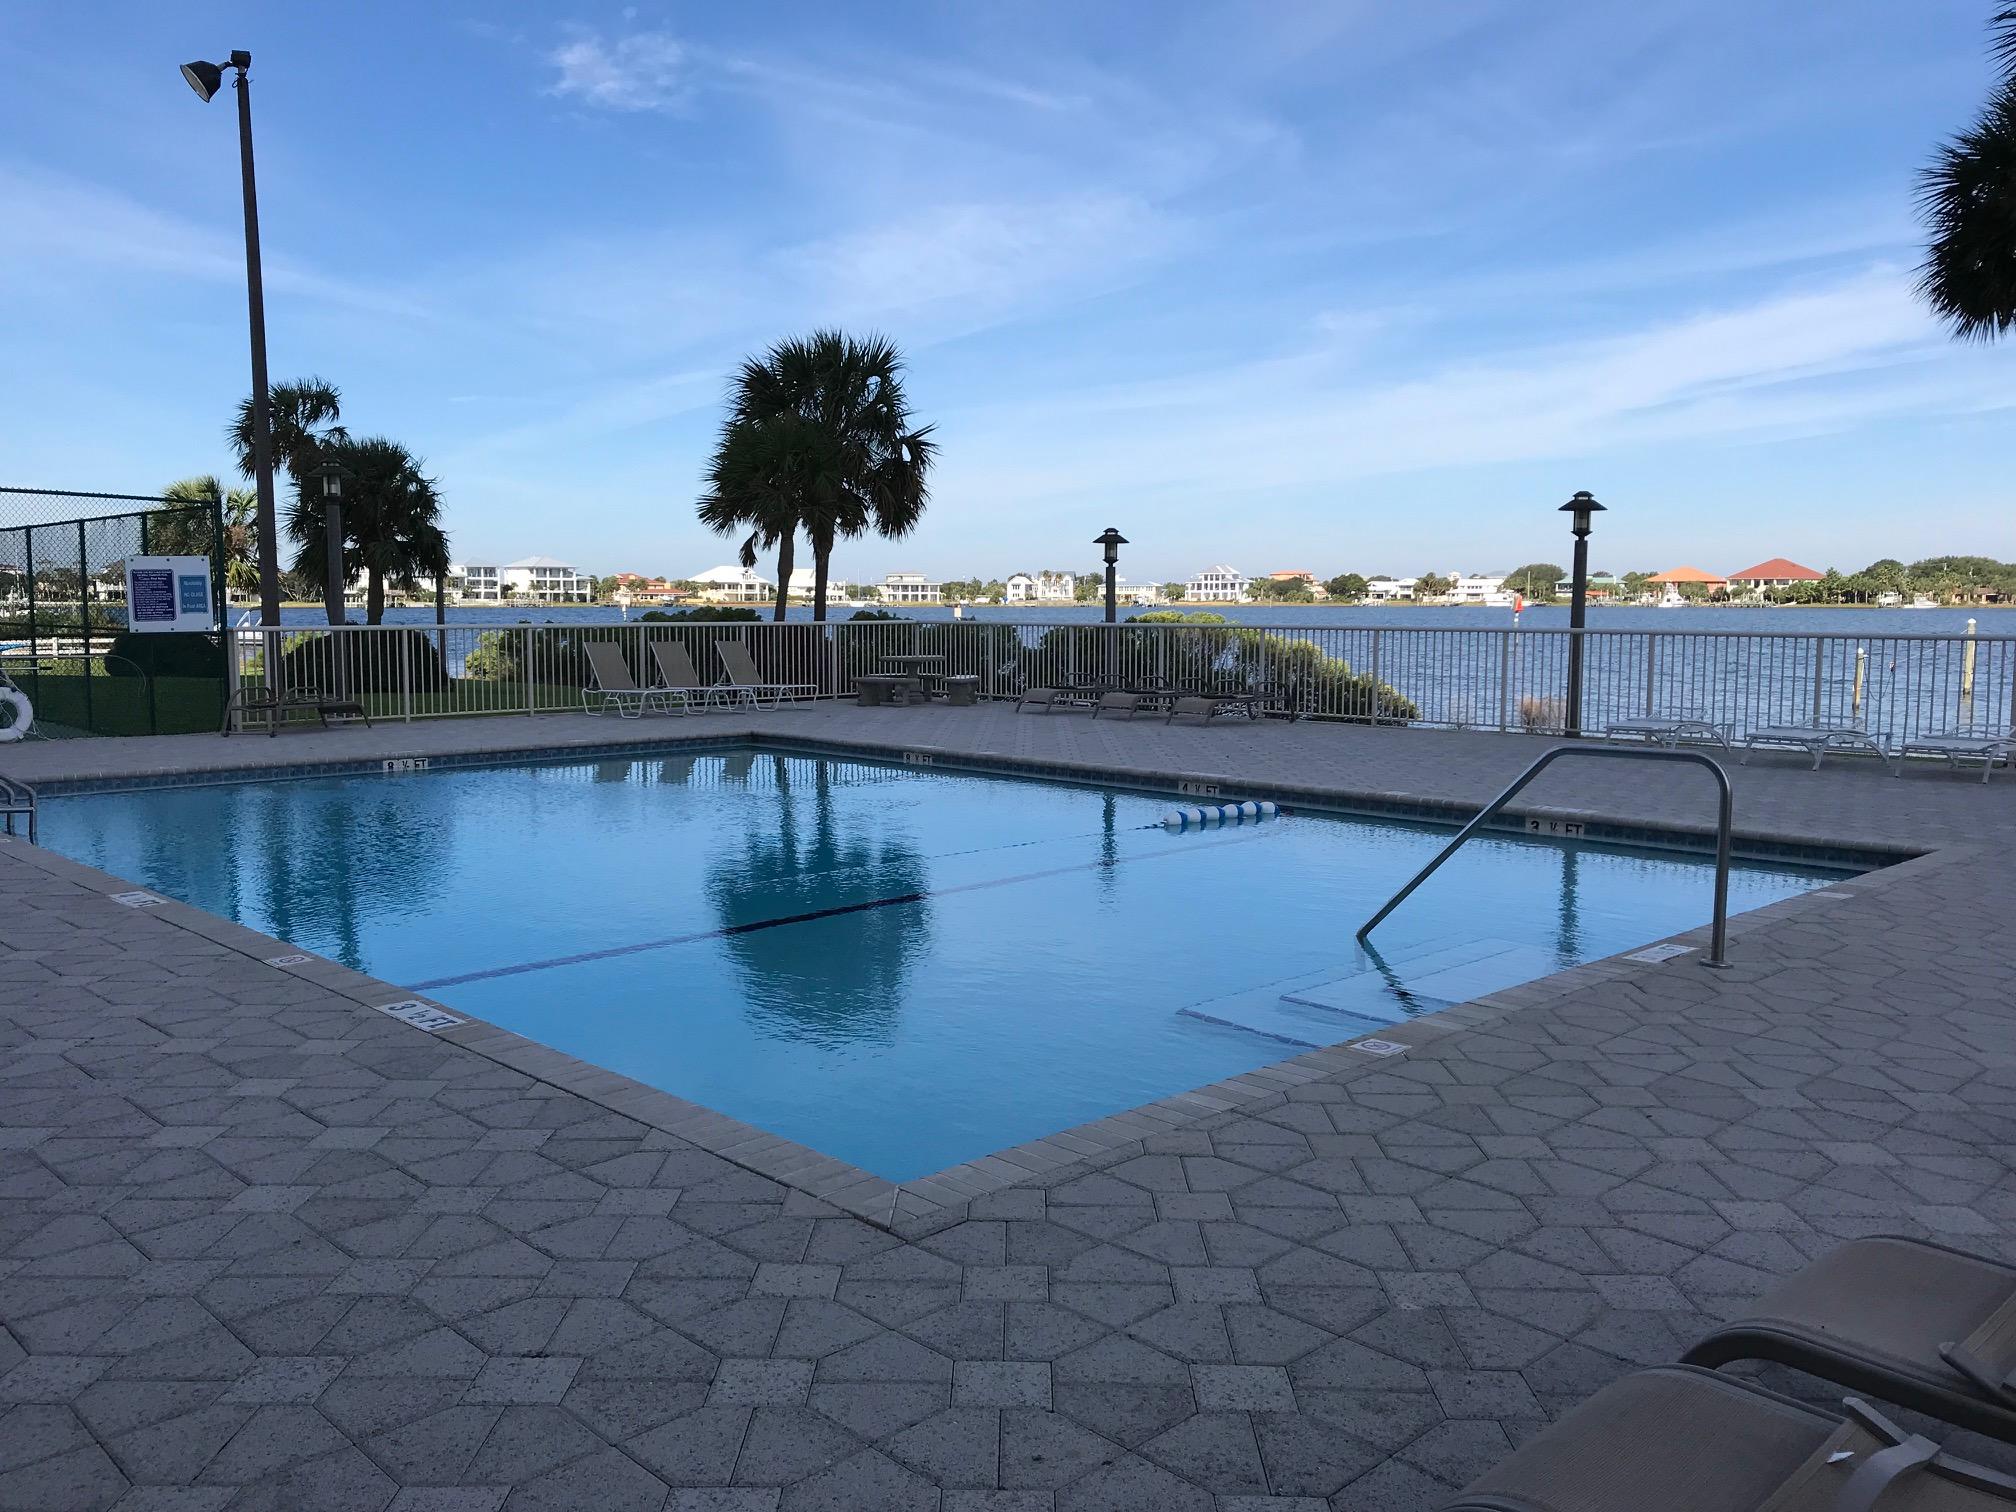 Sabine Yacht & Racquet Club #9D Condo rental in Sabine Yacht & Racquet Club ~ Pensacola Beach Condo Rentals by BeachGuide in Pensacola Beach Florida - #23